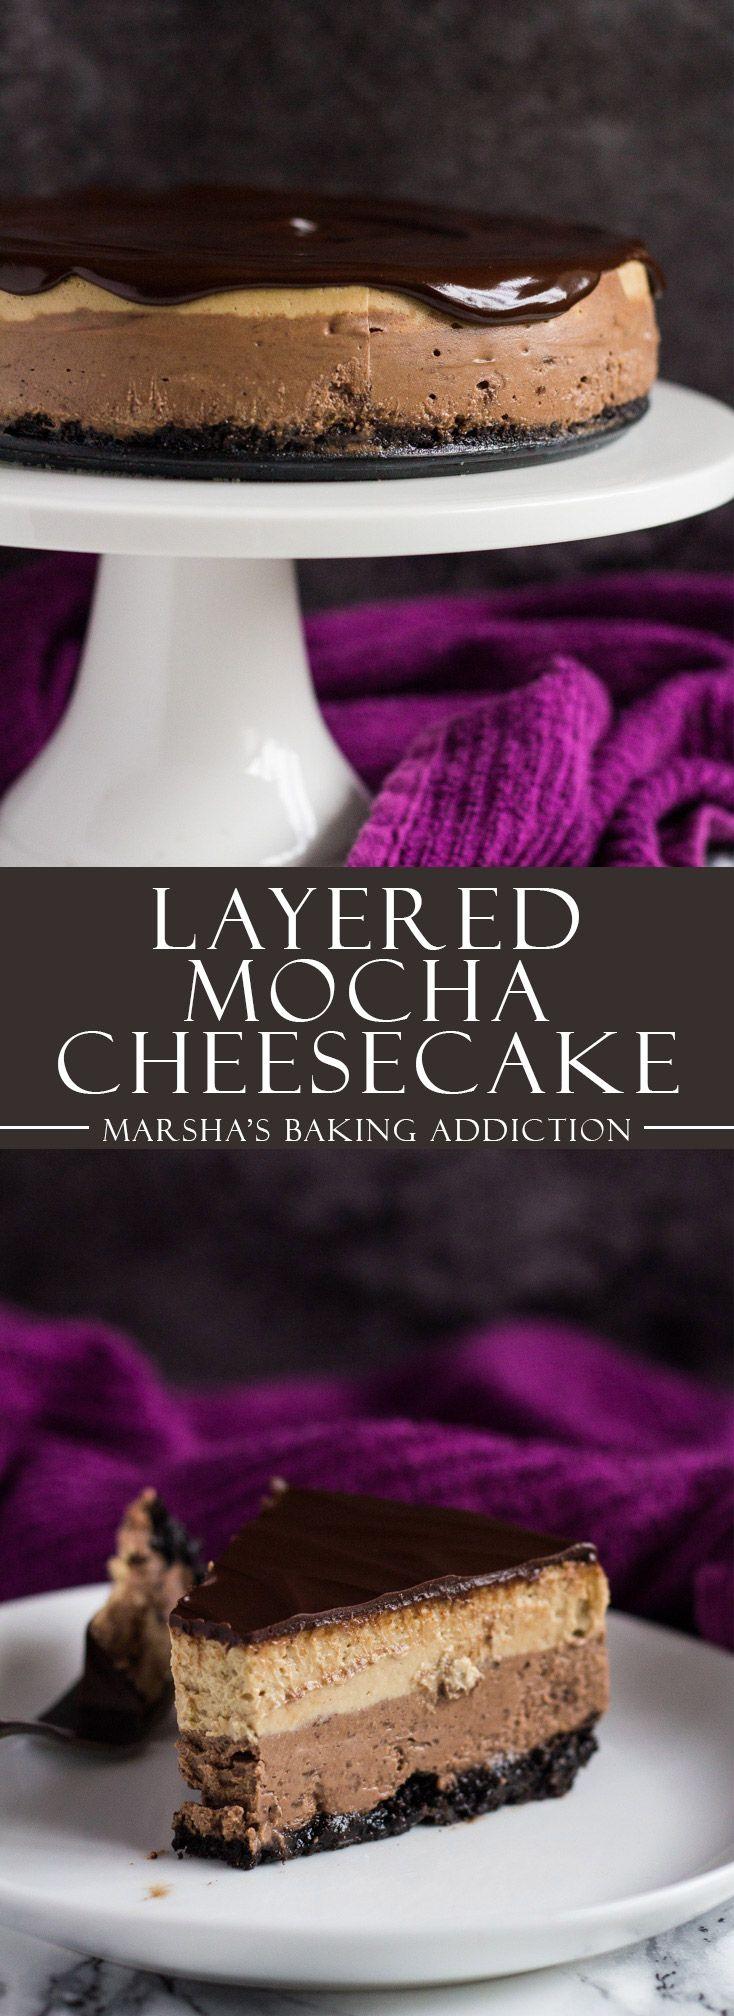 Layered Mocha Cheesecake   marshasbakingaddiction.com @marshasbakeblog